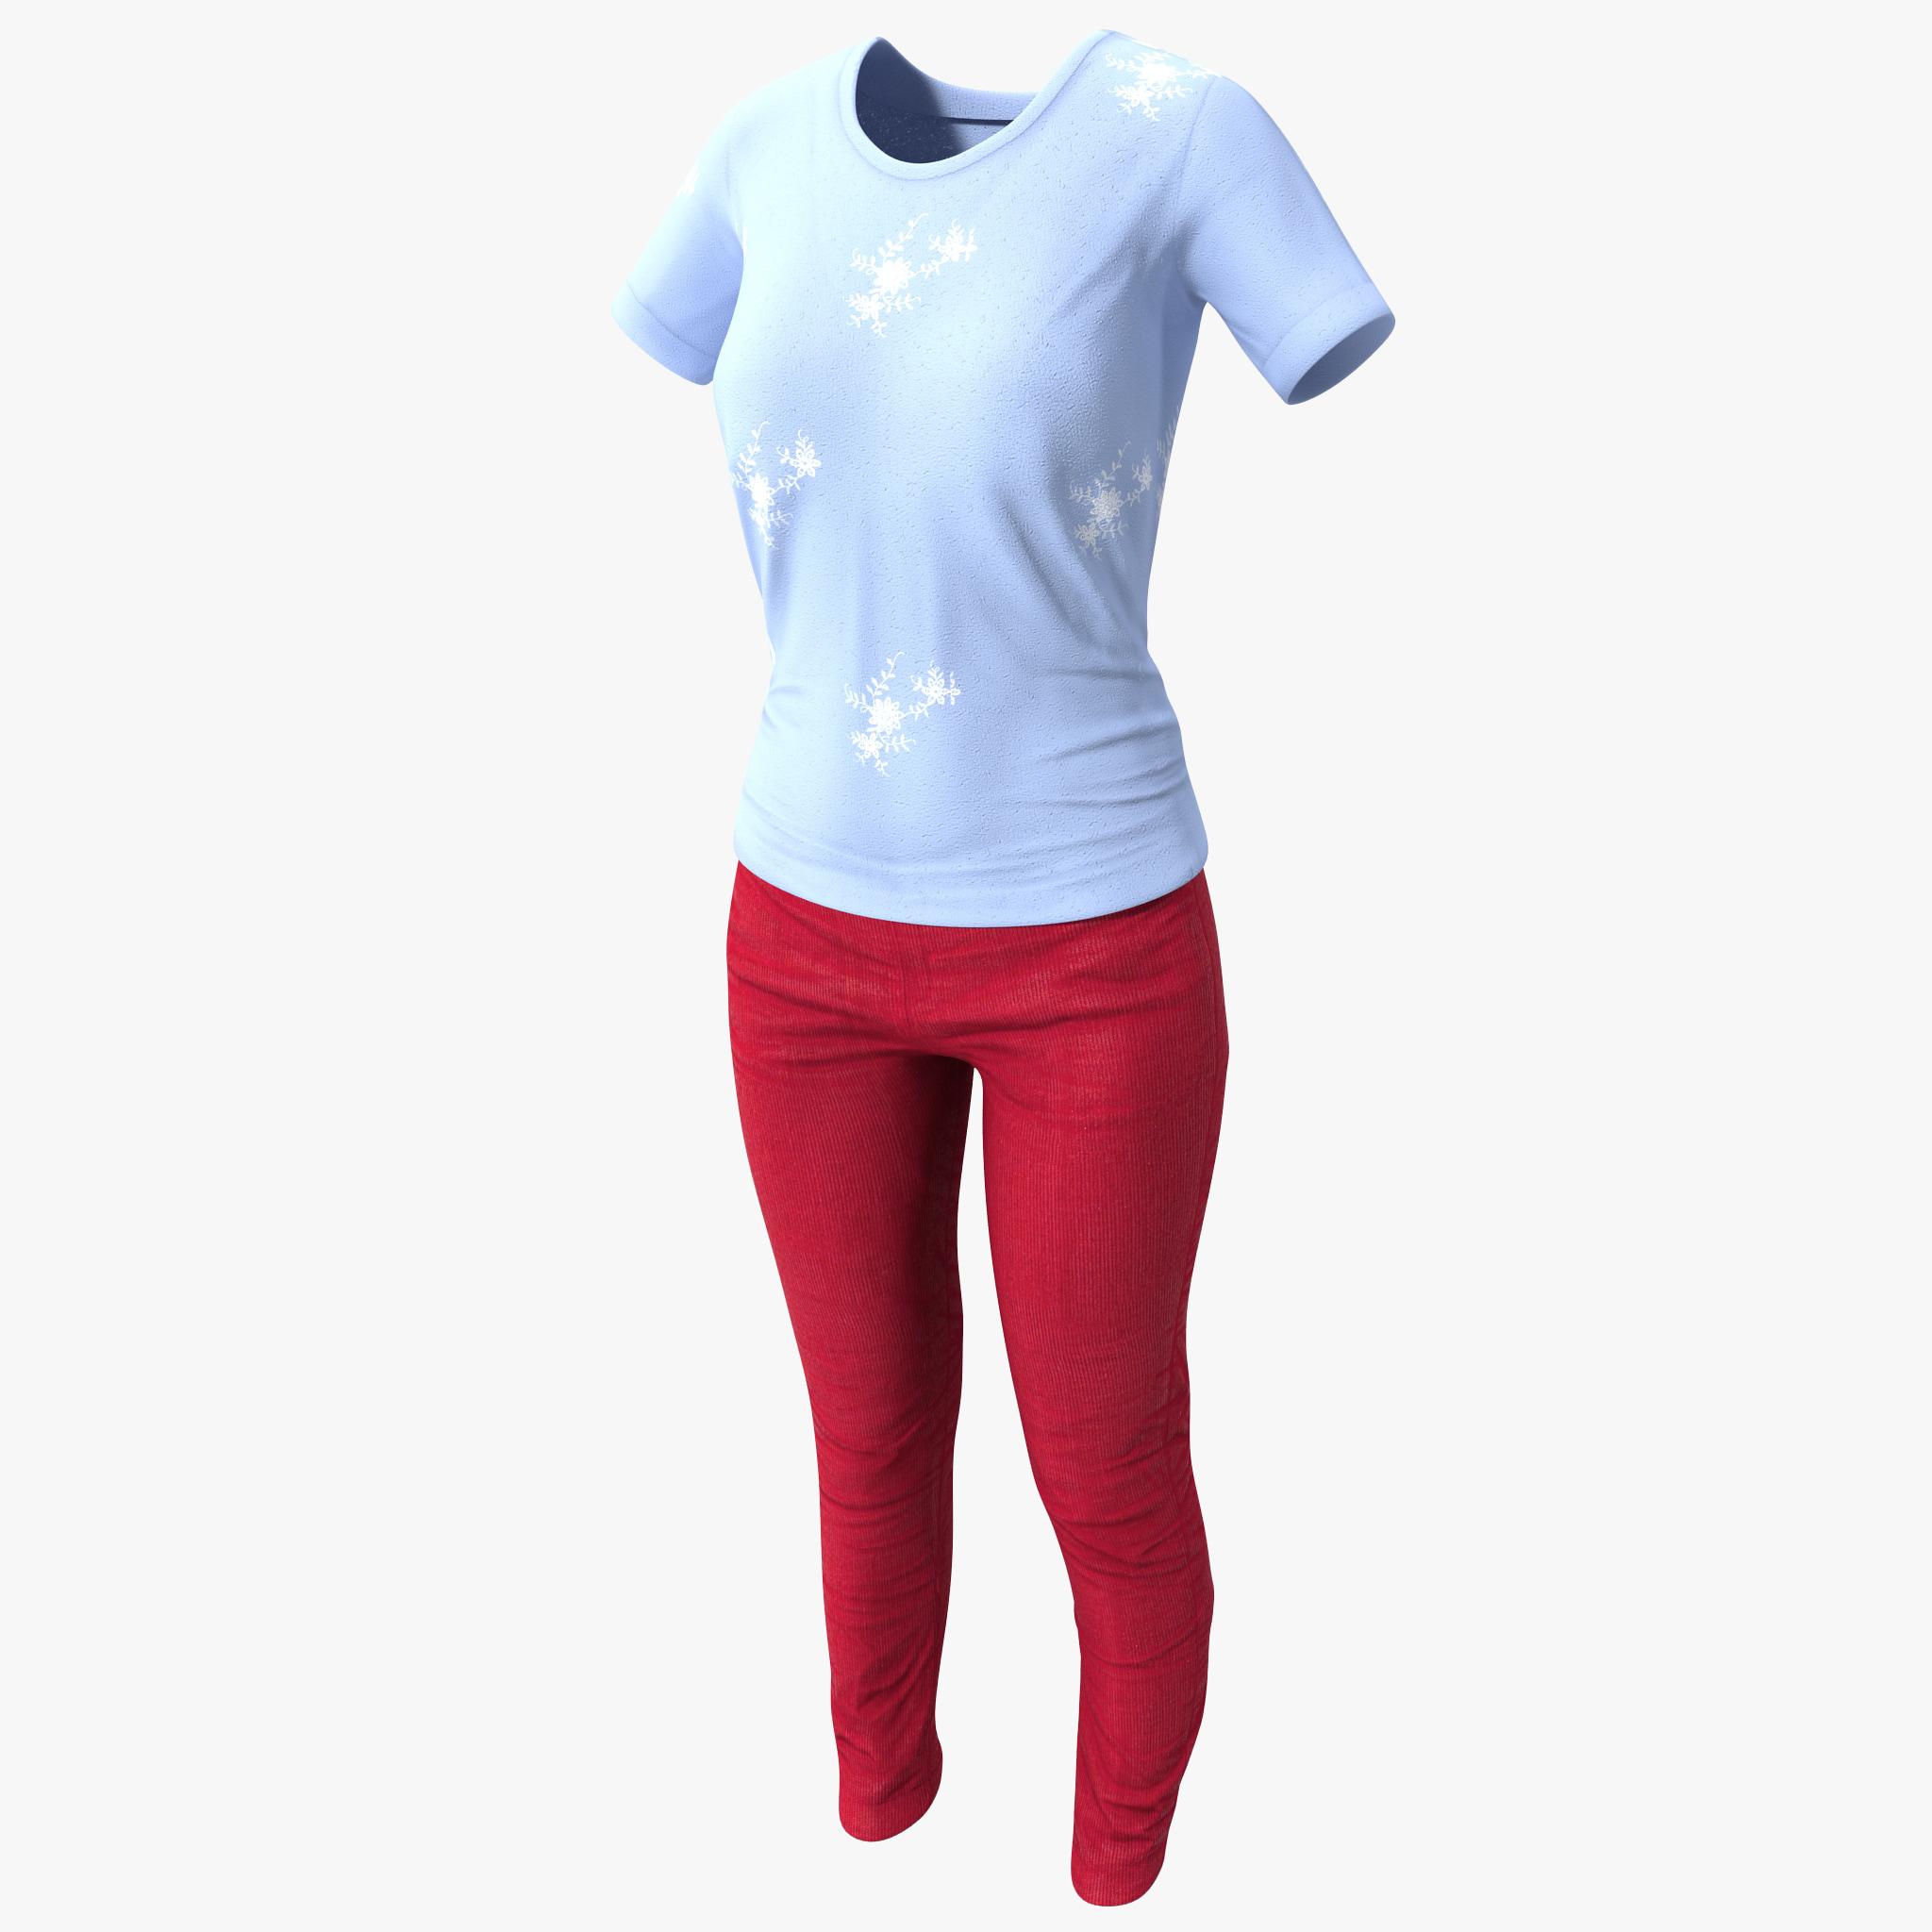 Female Casual Clothes 3_1.jpg